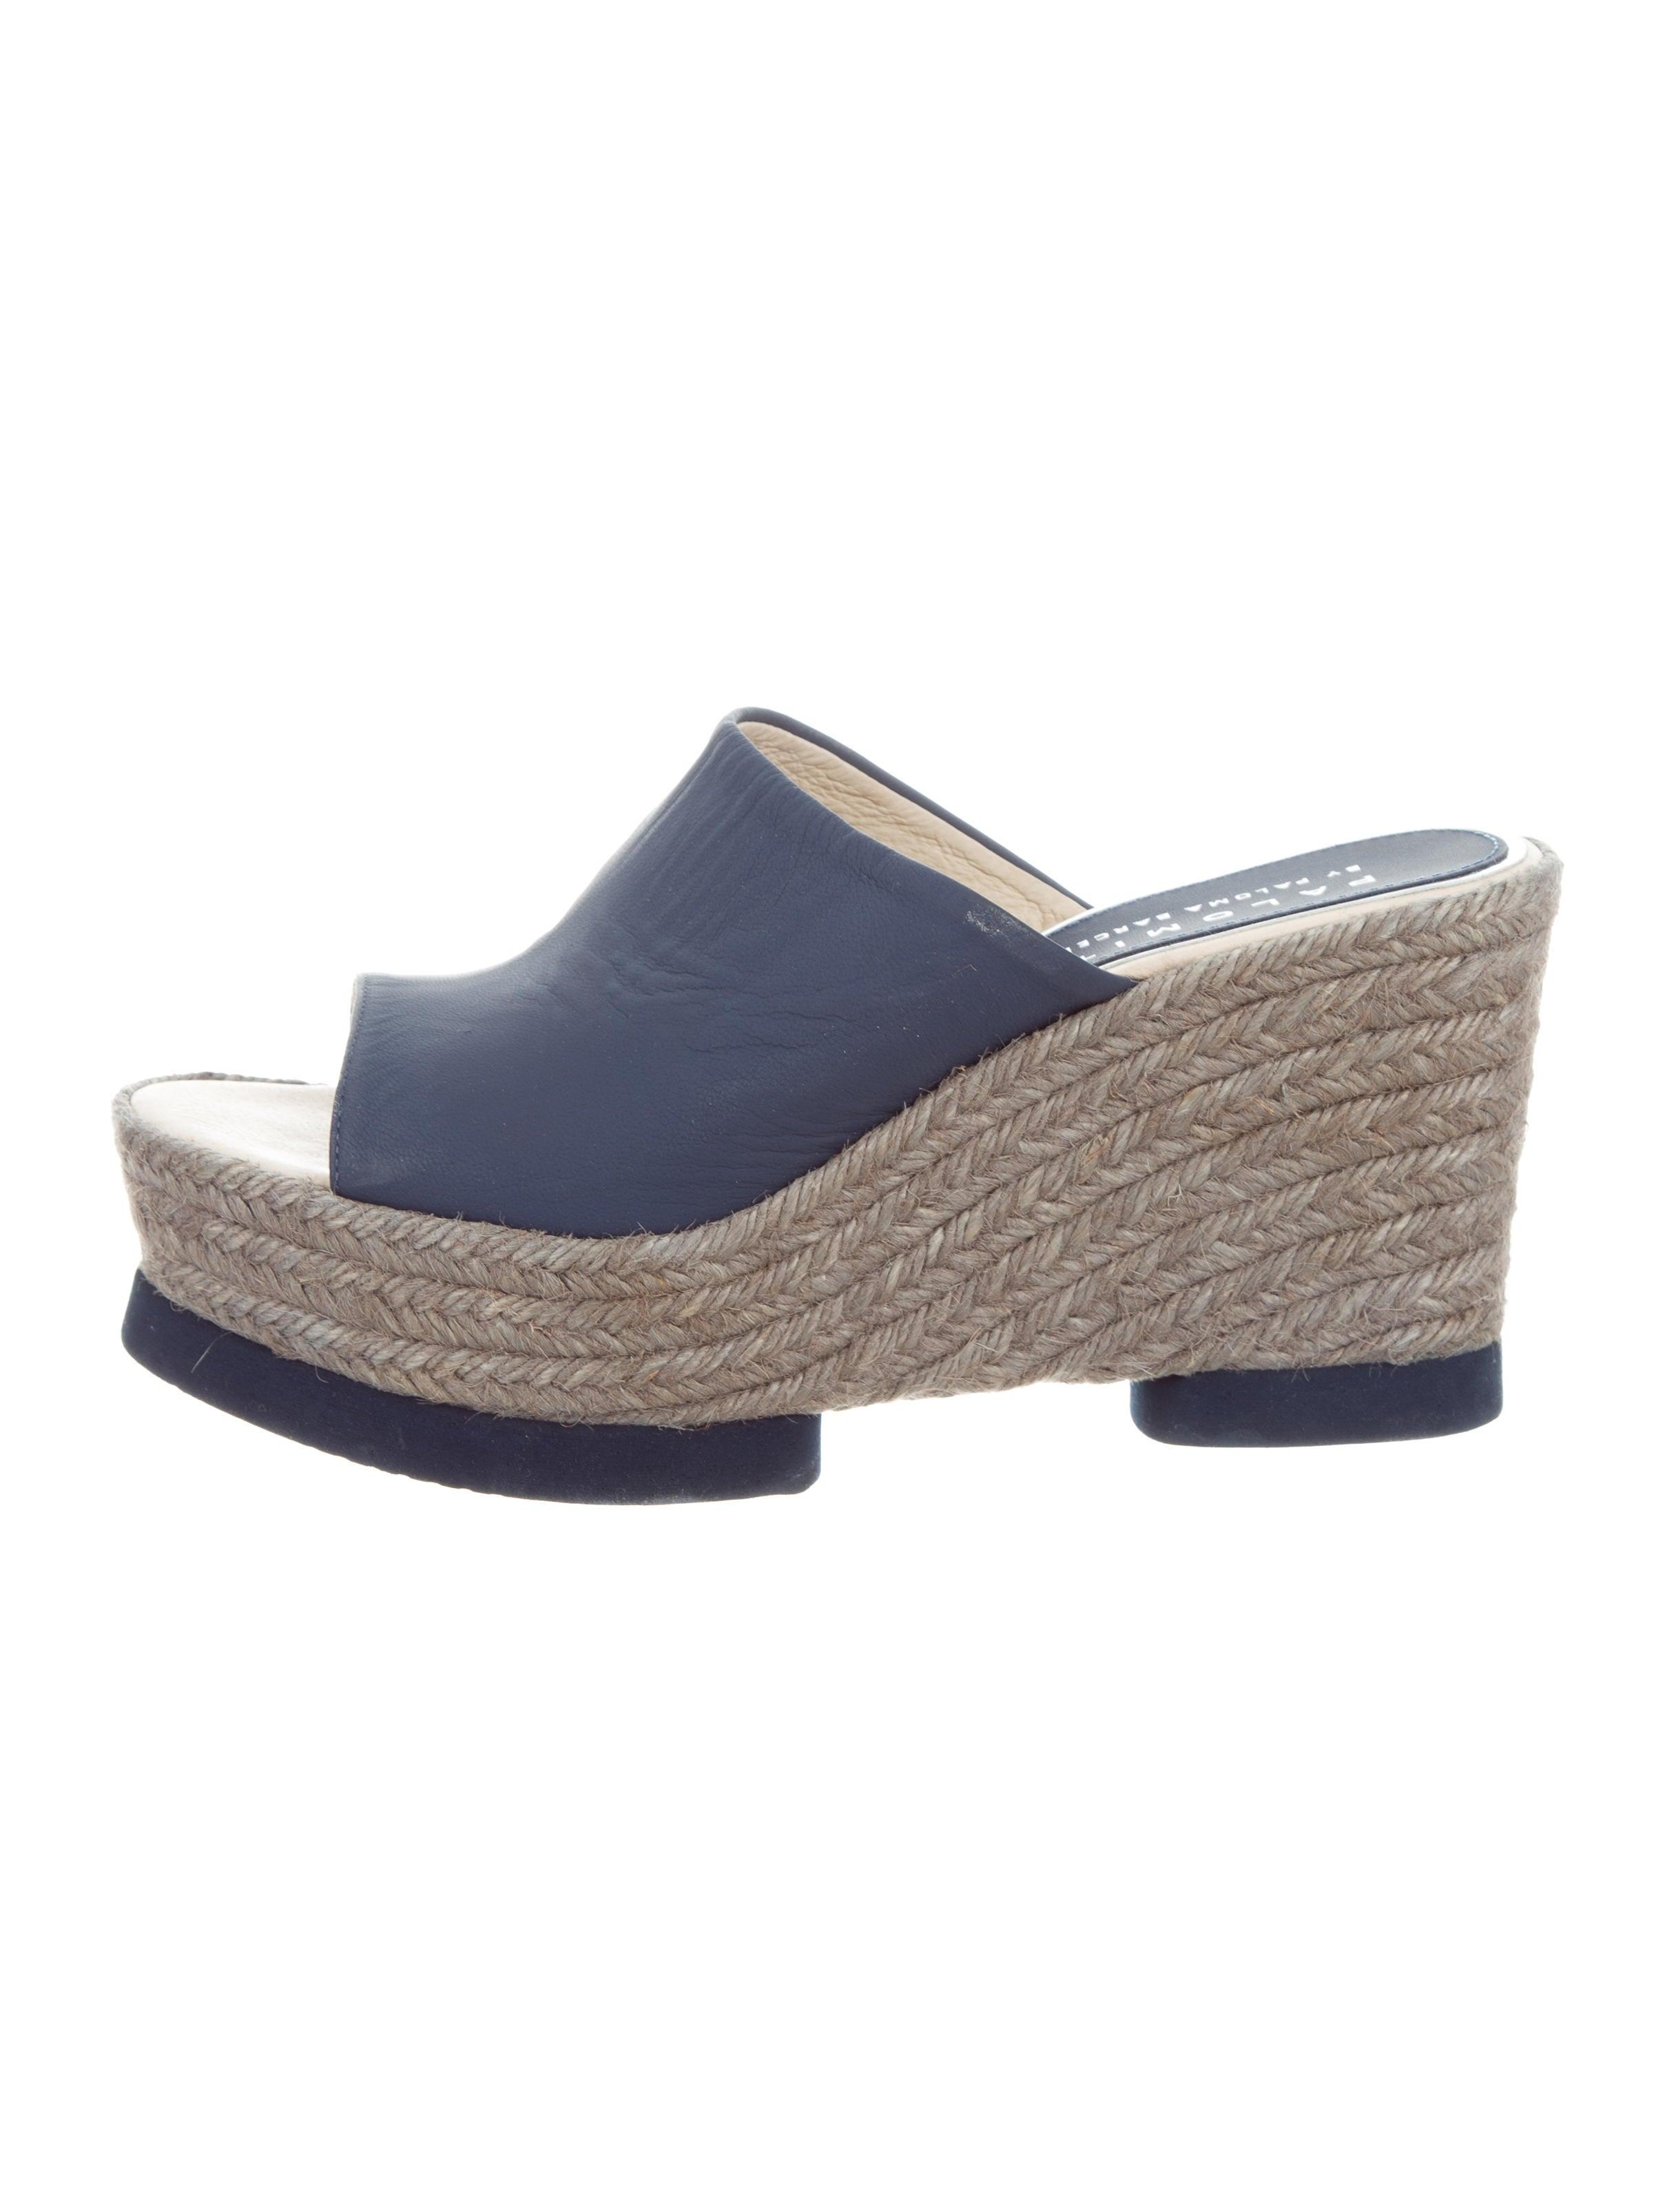 49656d4e348c Women · Shoes  Palomitas by Paloma Barceló Leather Espadrille Wedges. Leather  Espadrille Wedges